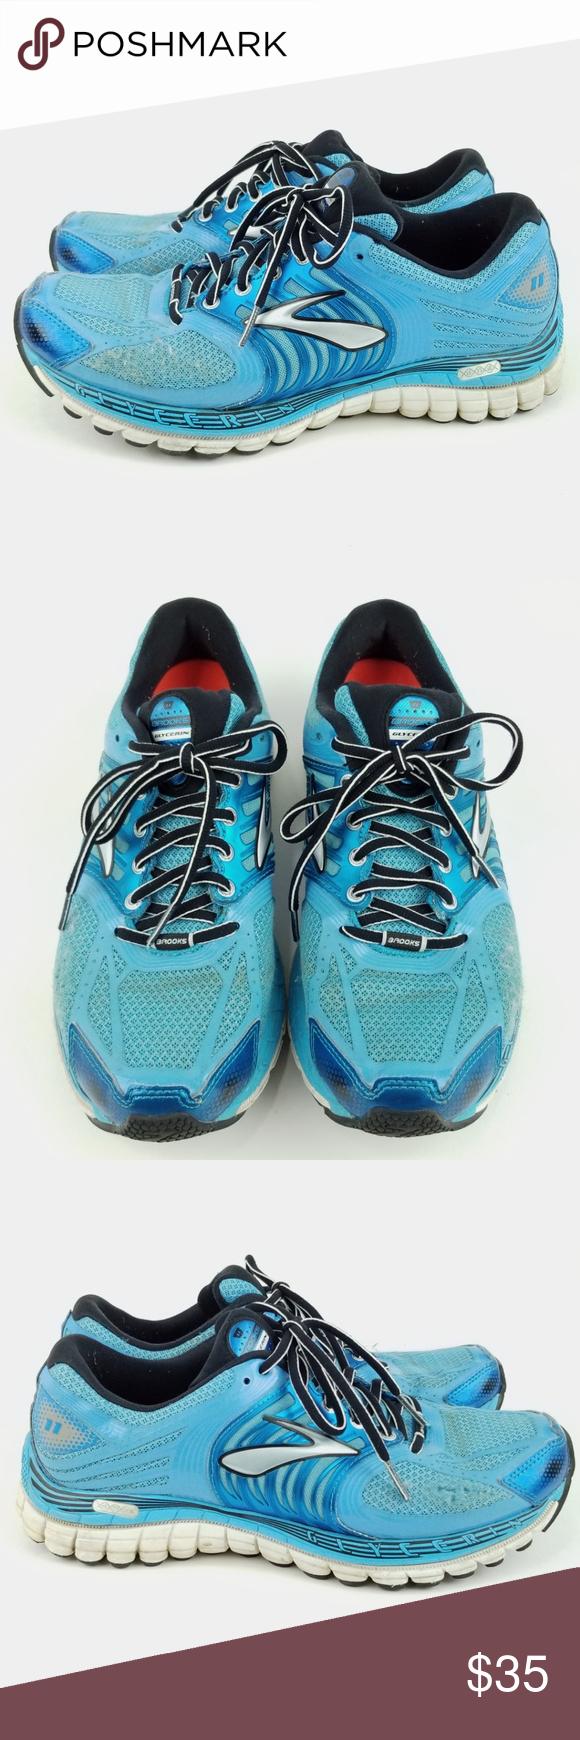 af7759f9f54 Brooks Glycerin 11 Running Shoe 9.5 EF52 Brooks Glycerin 11 Womens Running  Shoe Size 9.5 Blue Athletic Sneaker Good Used Condition